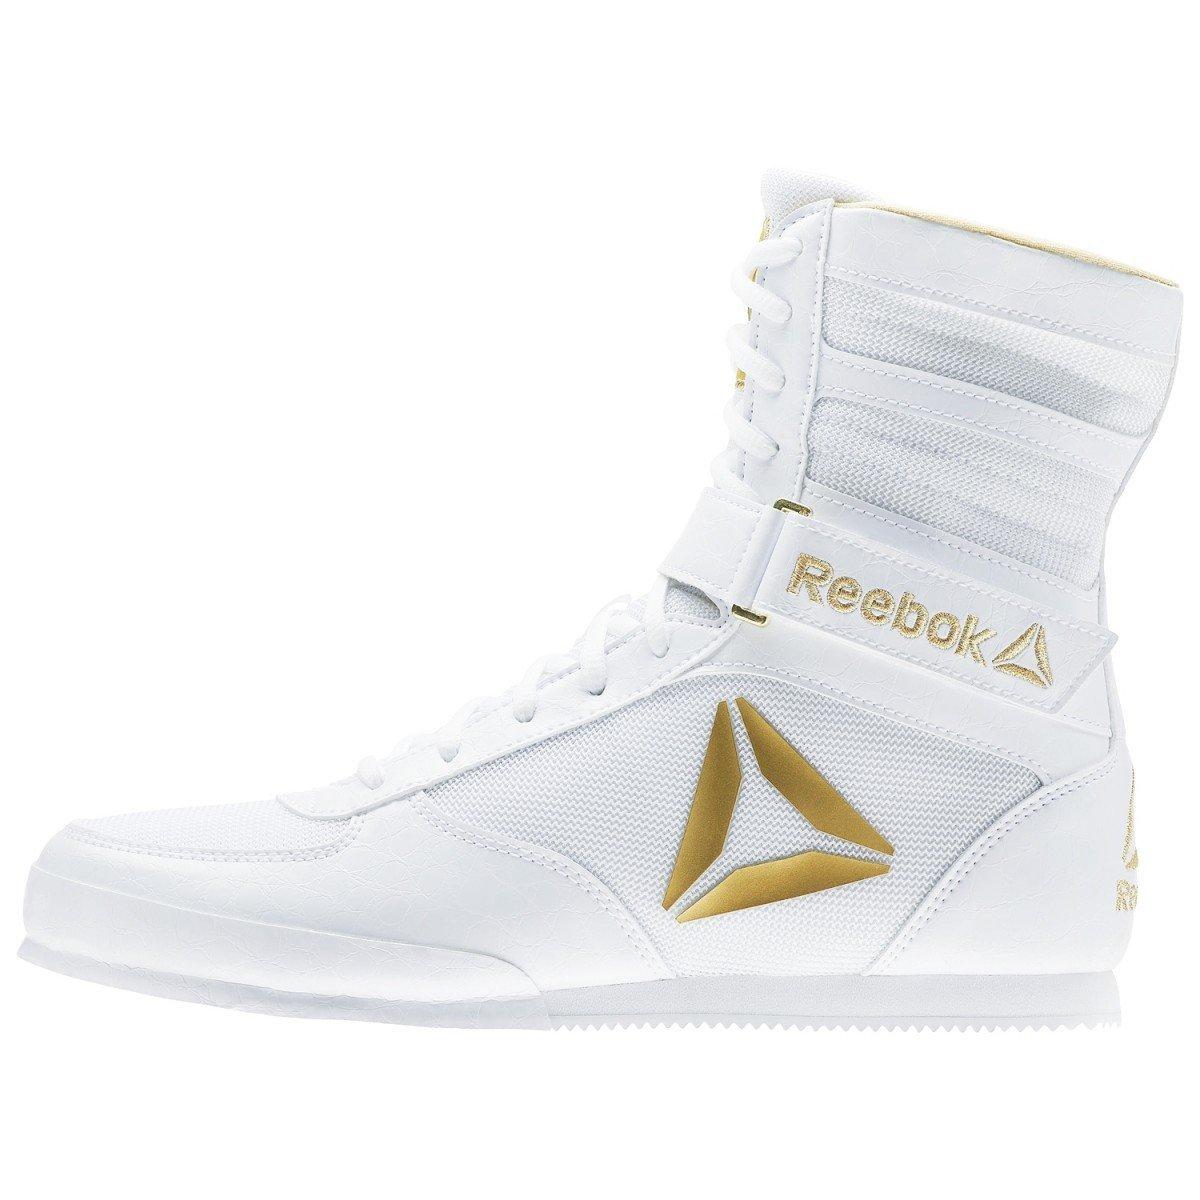 2a5b0db49a3 Galleon - Reebok Renegade Pro 3 Boxing Boot